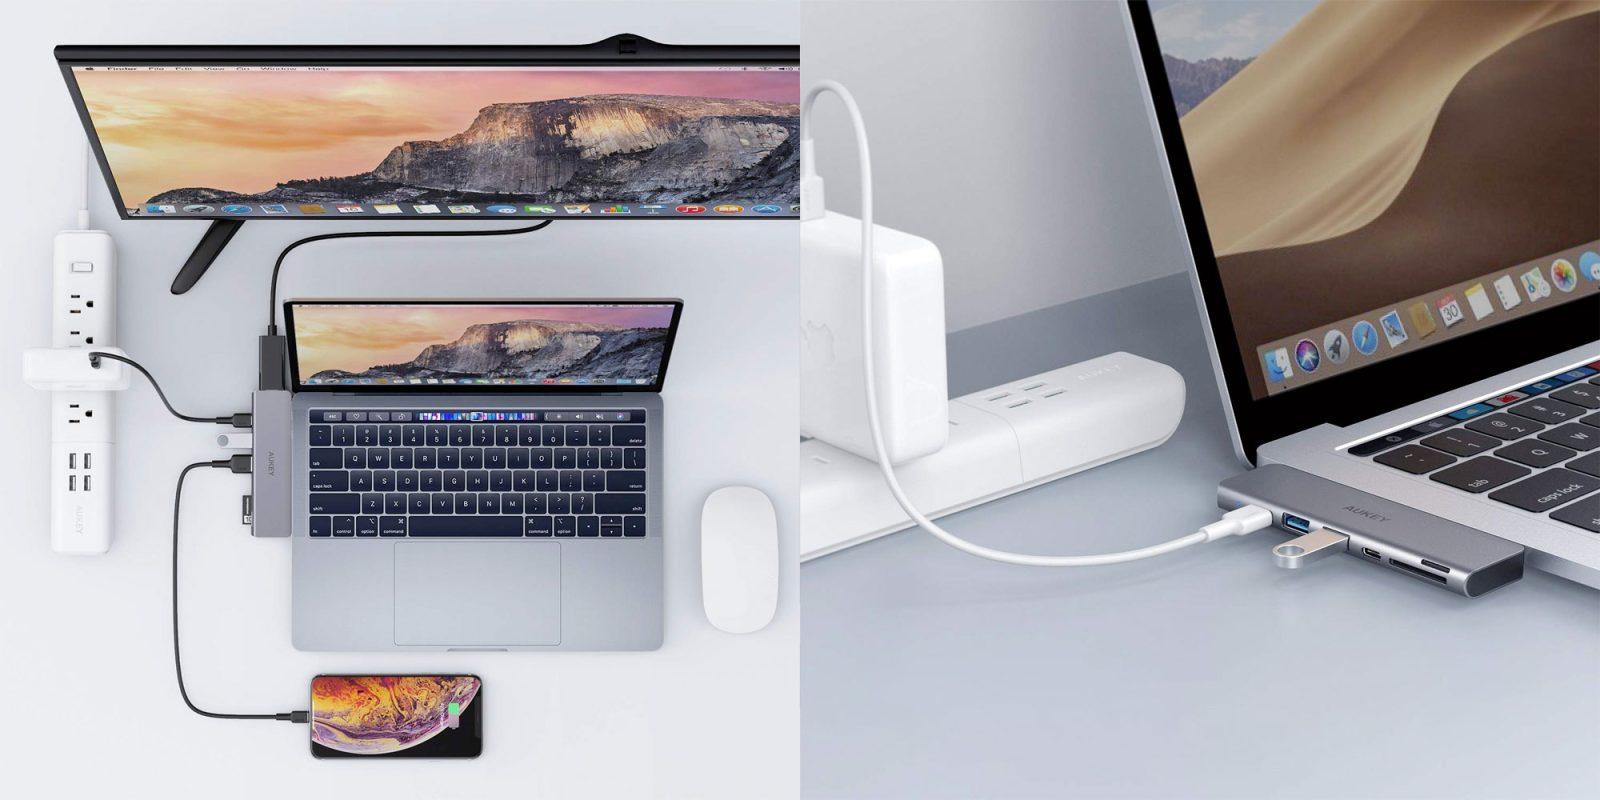 Aukey's 7-in-1 USB-C hub has Thunderbolt 3 passthrough for $30 (Reg. $40)